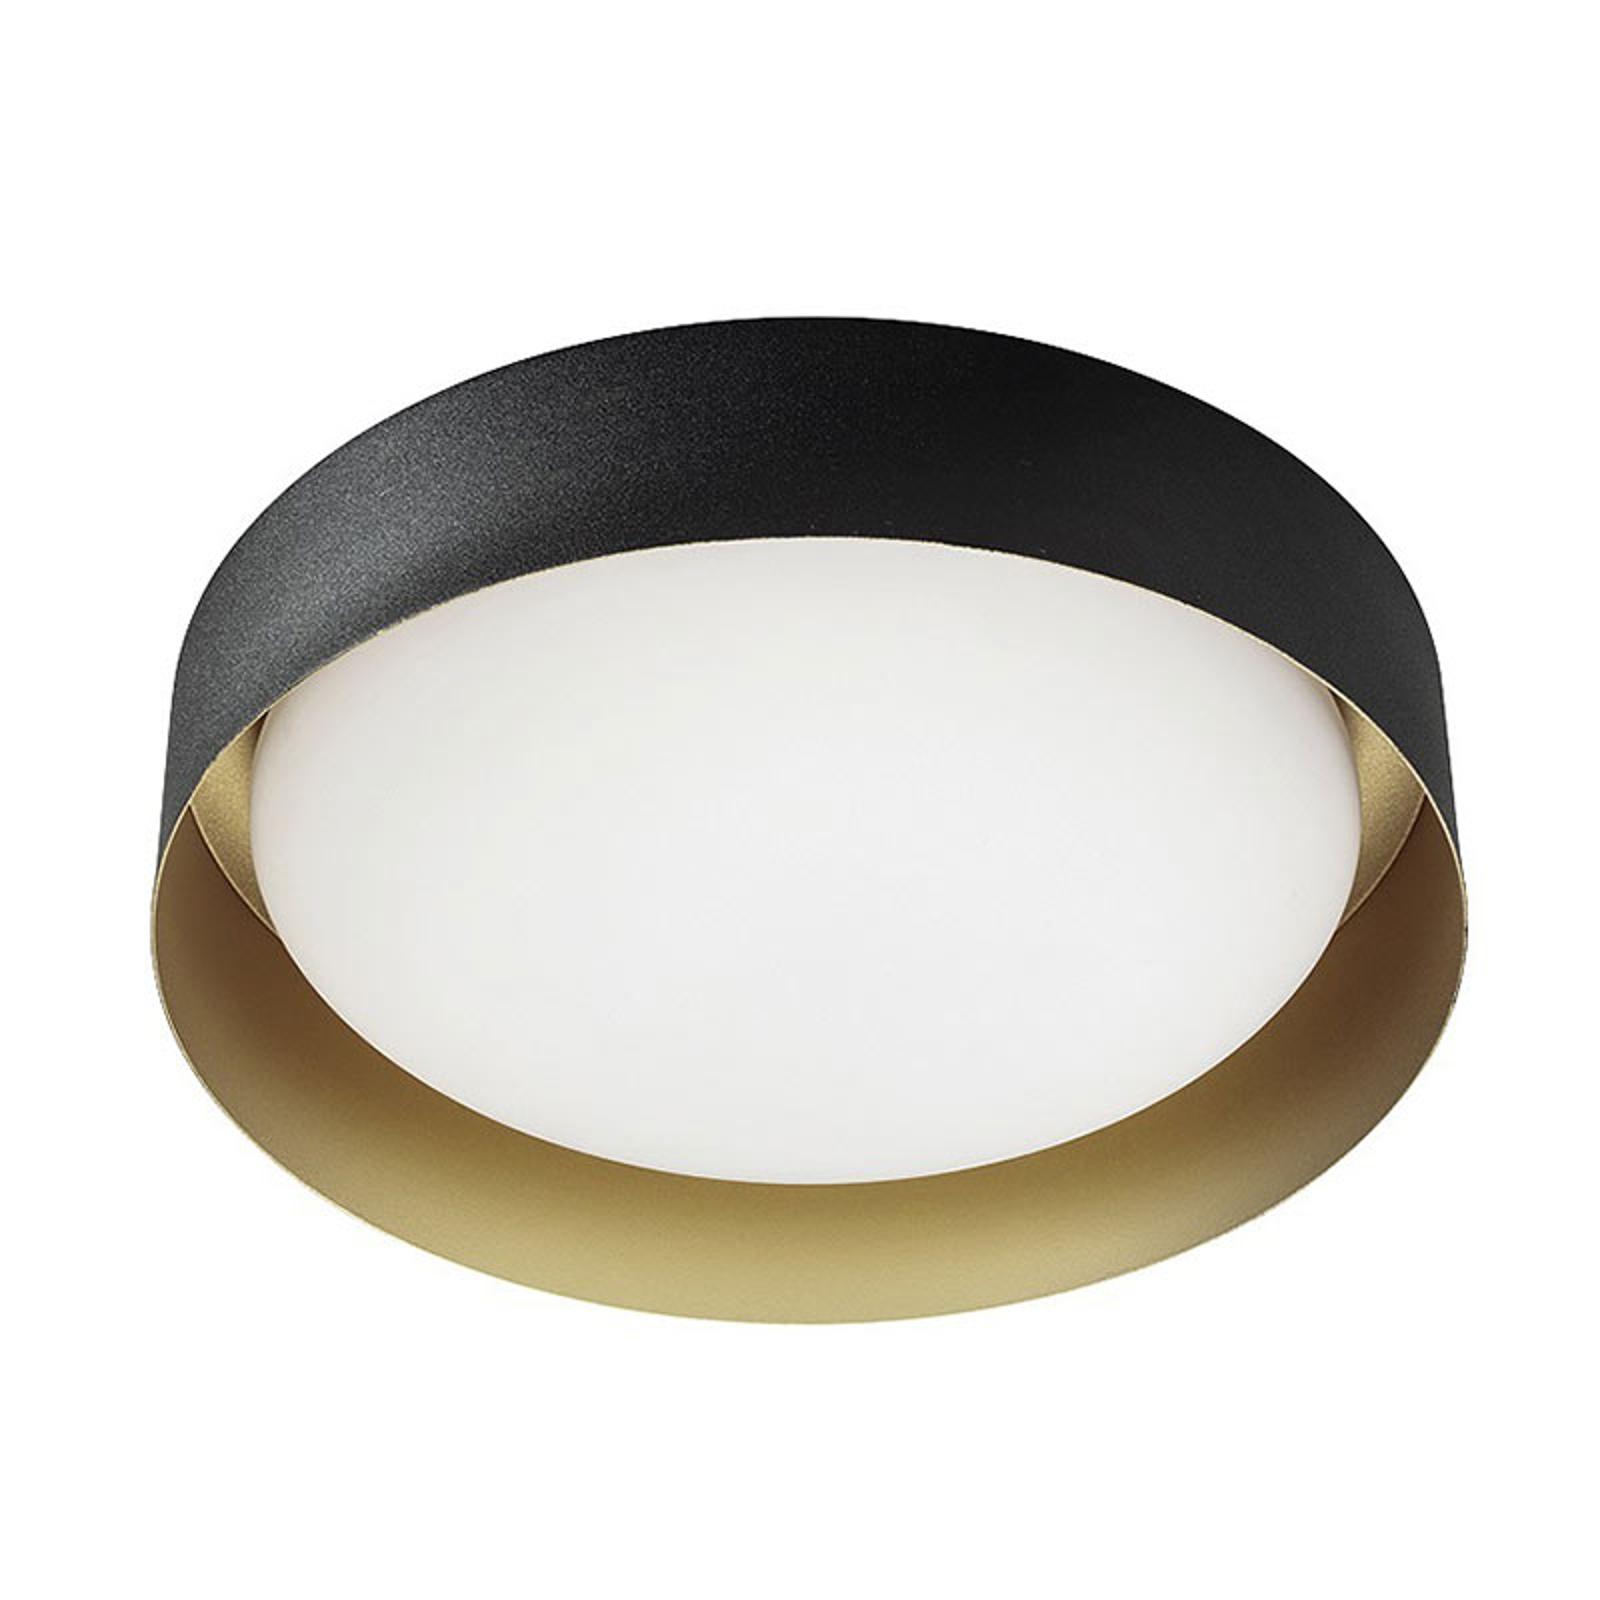 LED plafondlamp Crew 2, Ø 33 cm, zwart/goud